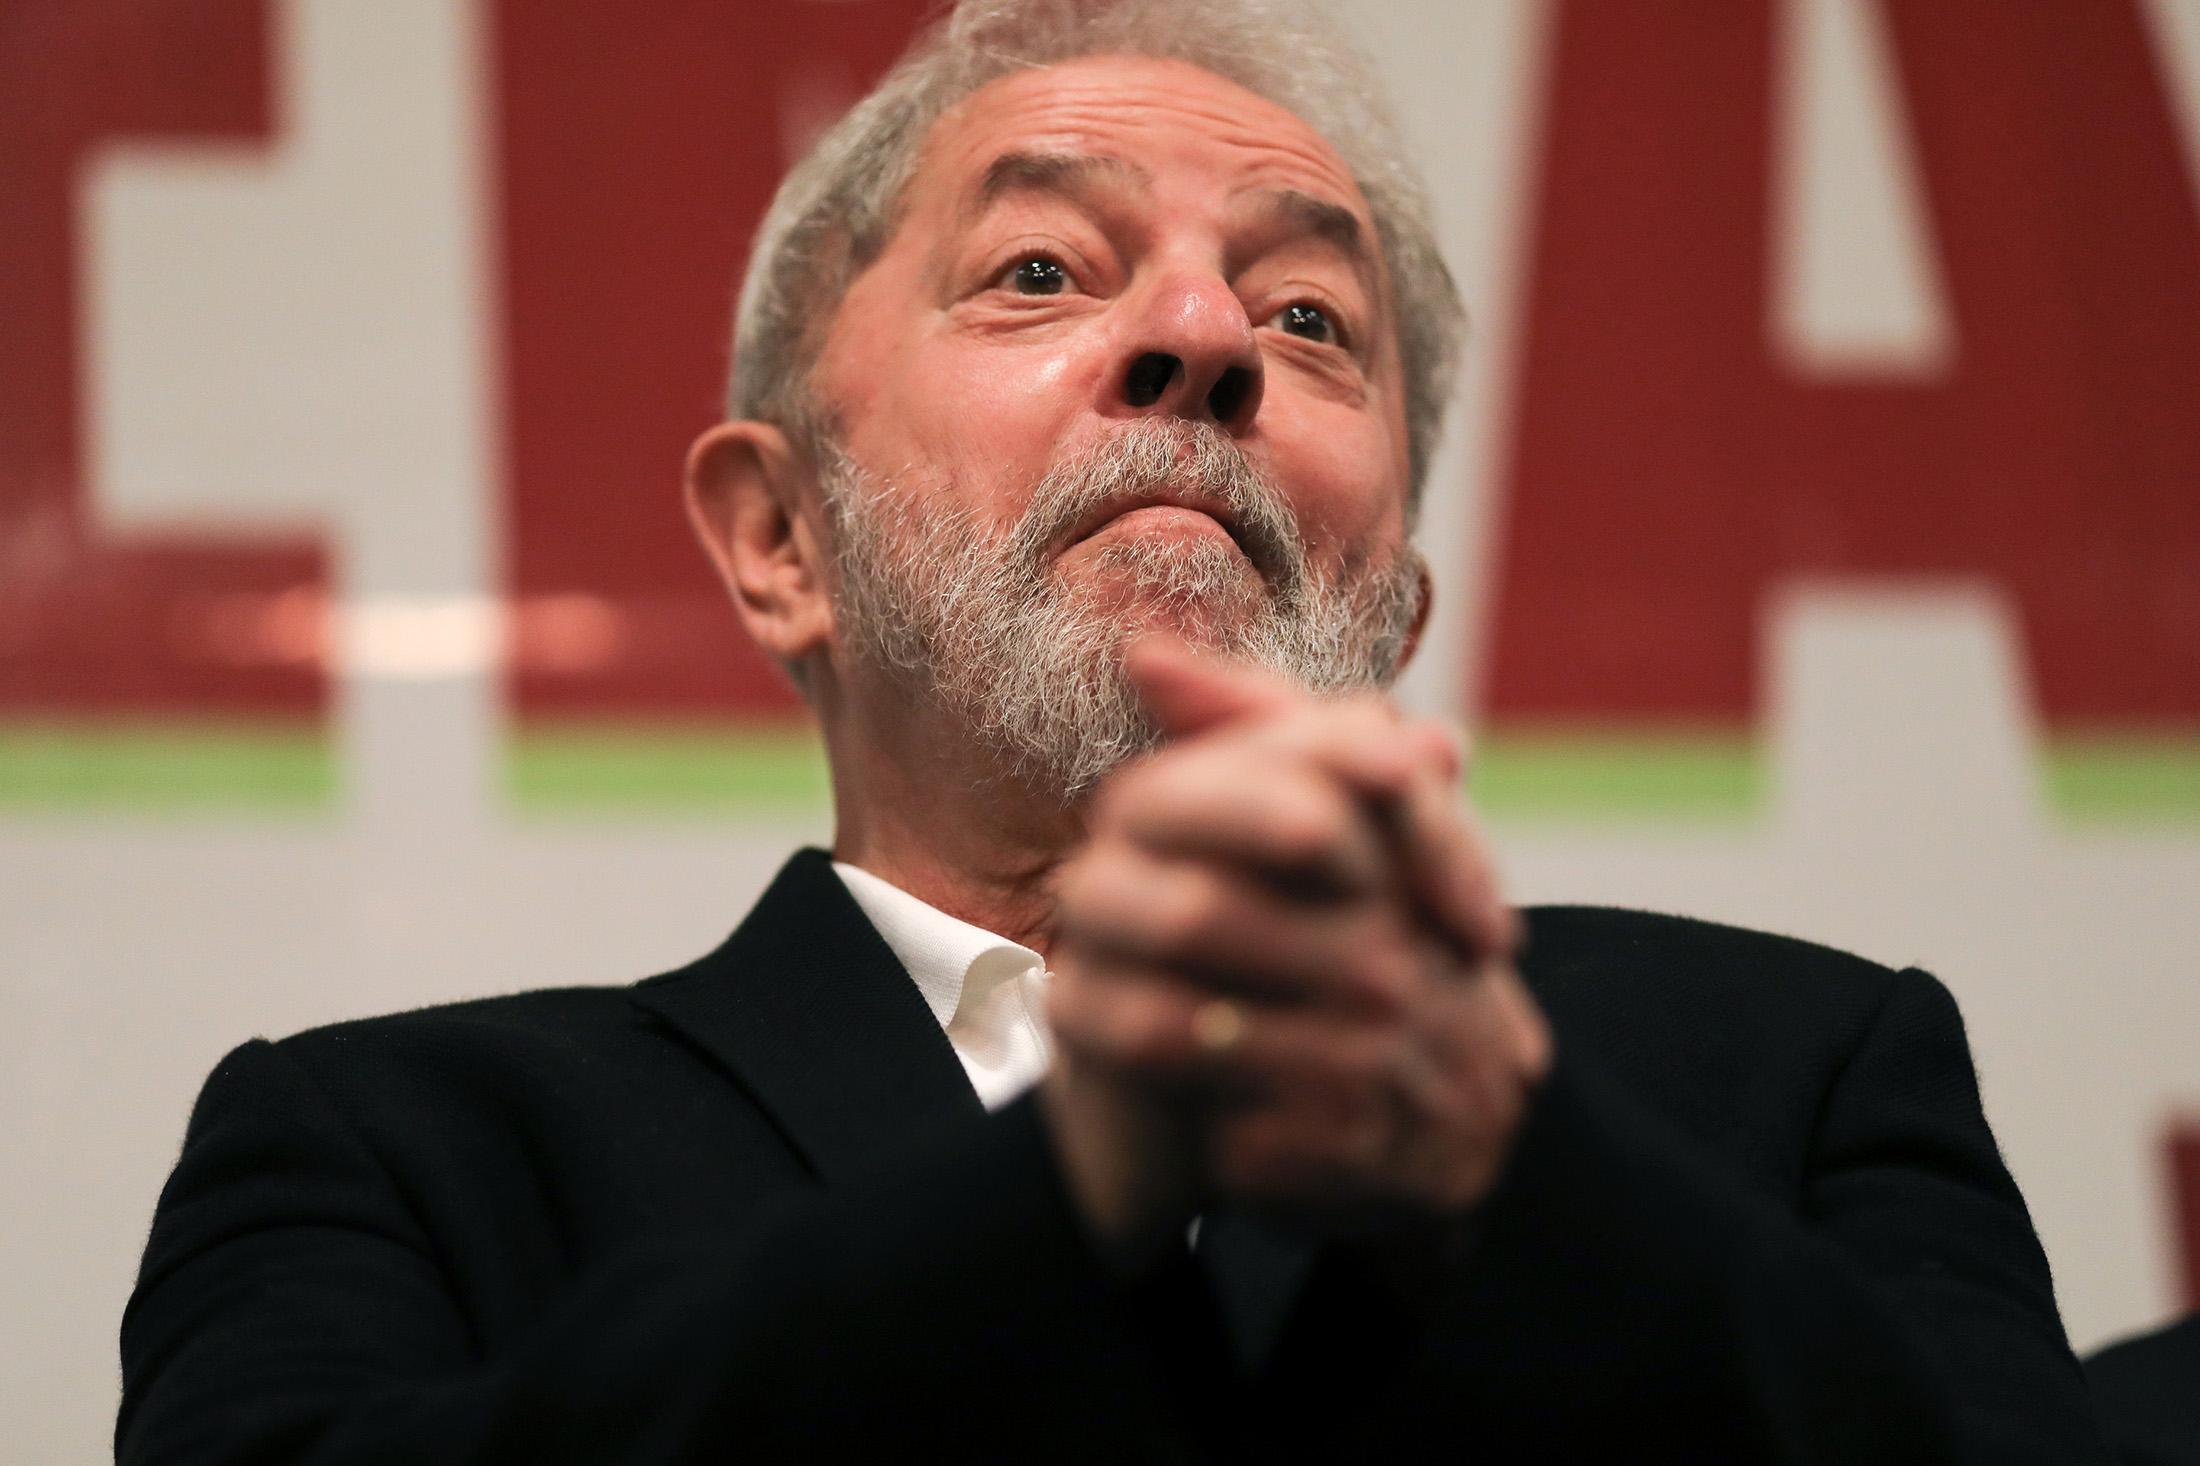 Brazil's Lula Keeps Campaigning Despite Conviction